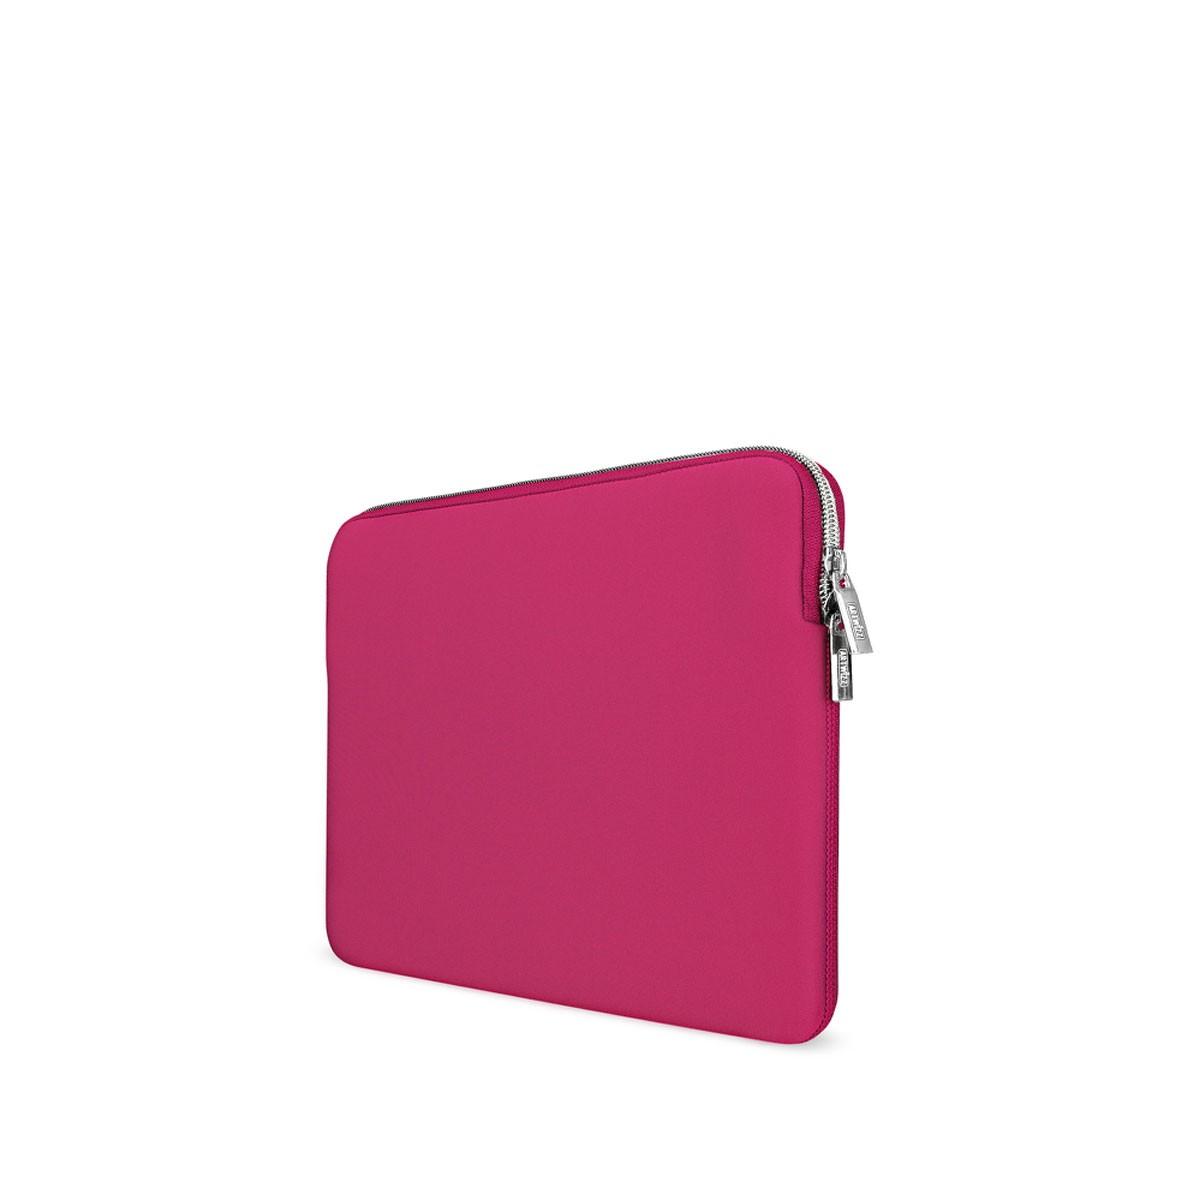 "Obal na MacBook Pro 13"" Artwizz - růžový"